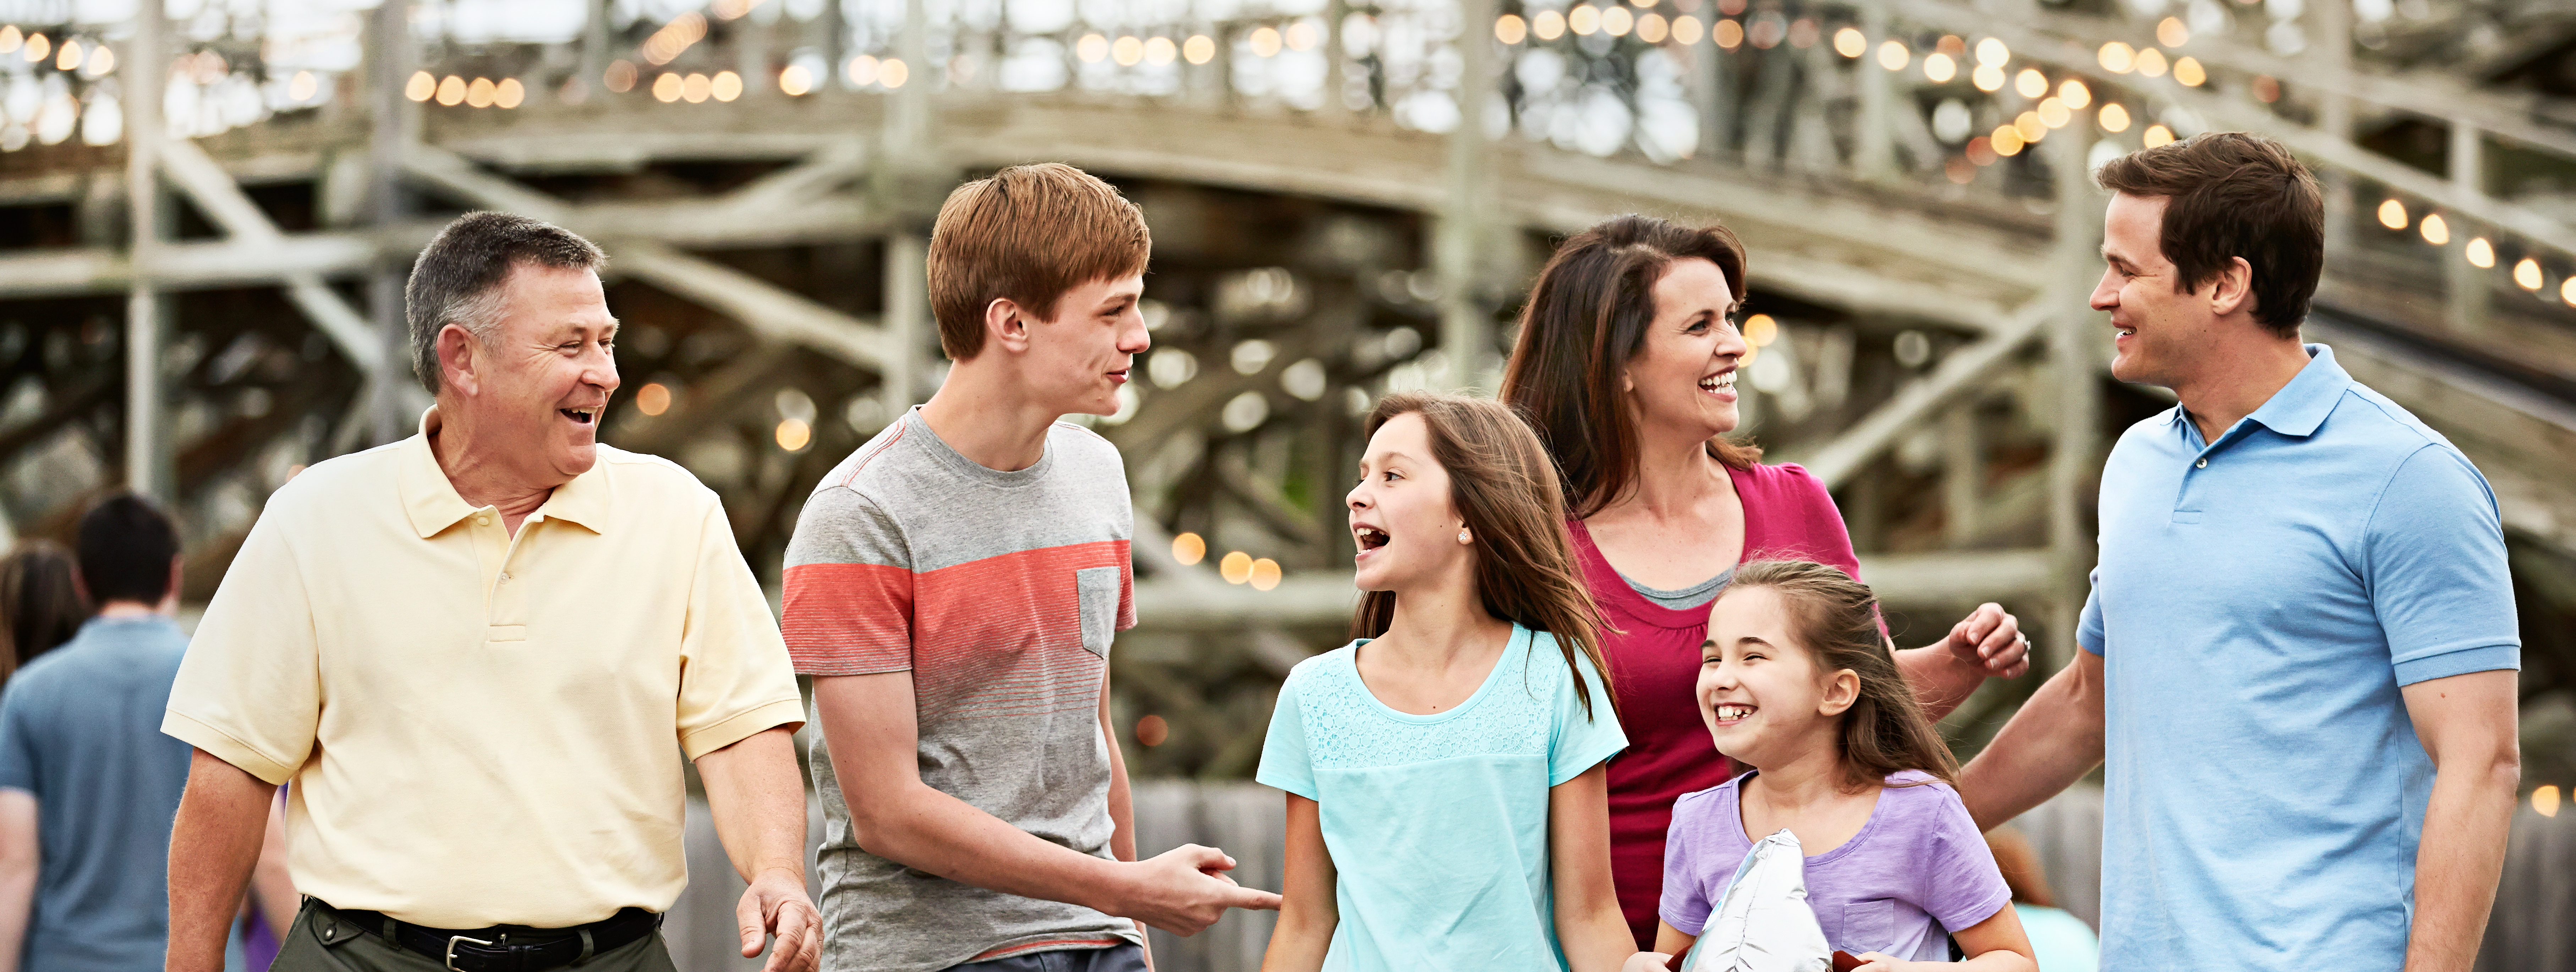 Family Fun | Visit Hershey Harrisburg